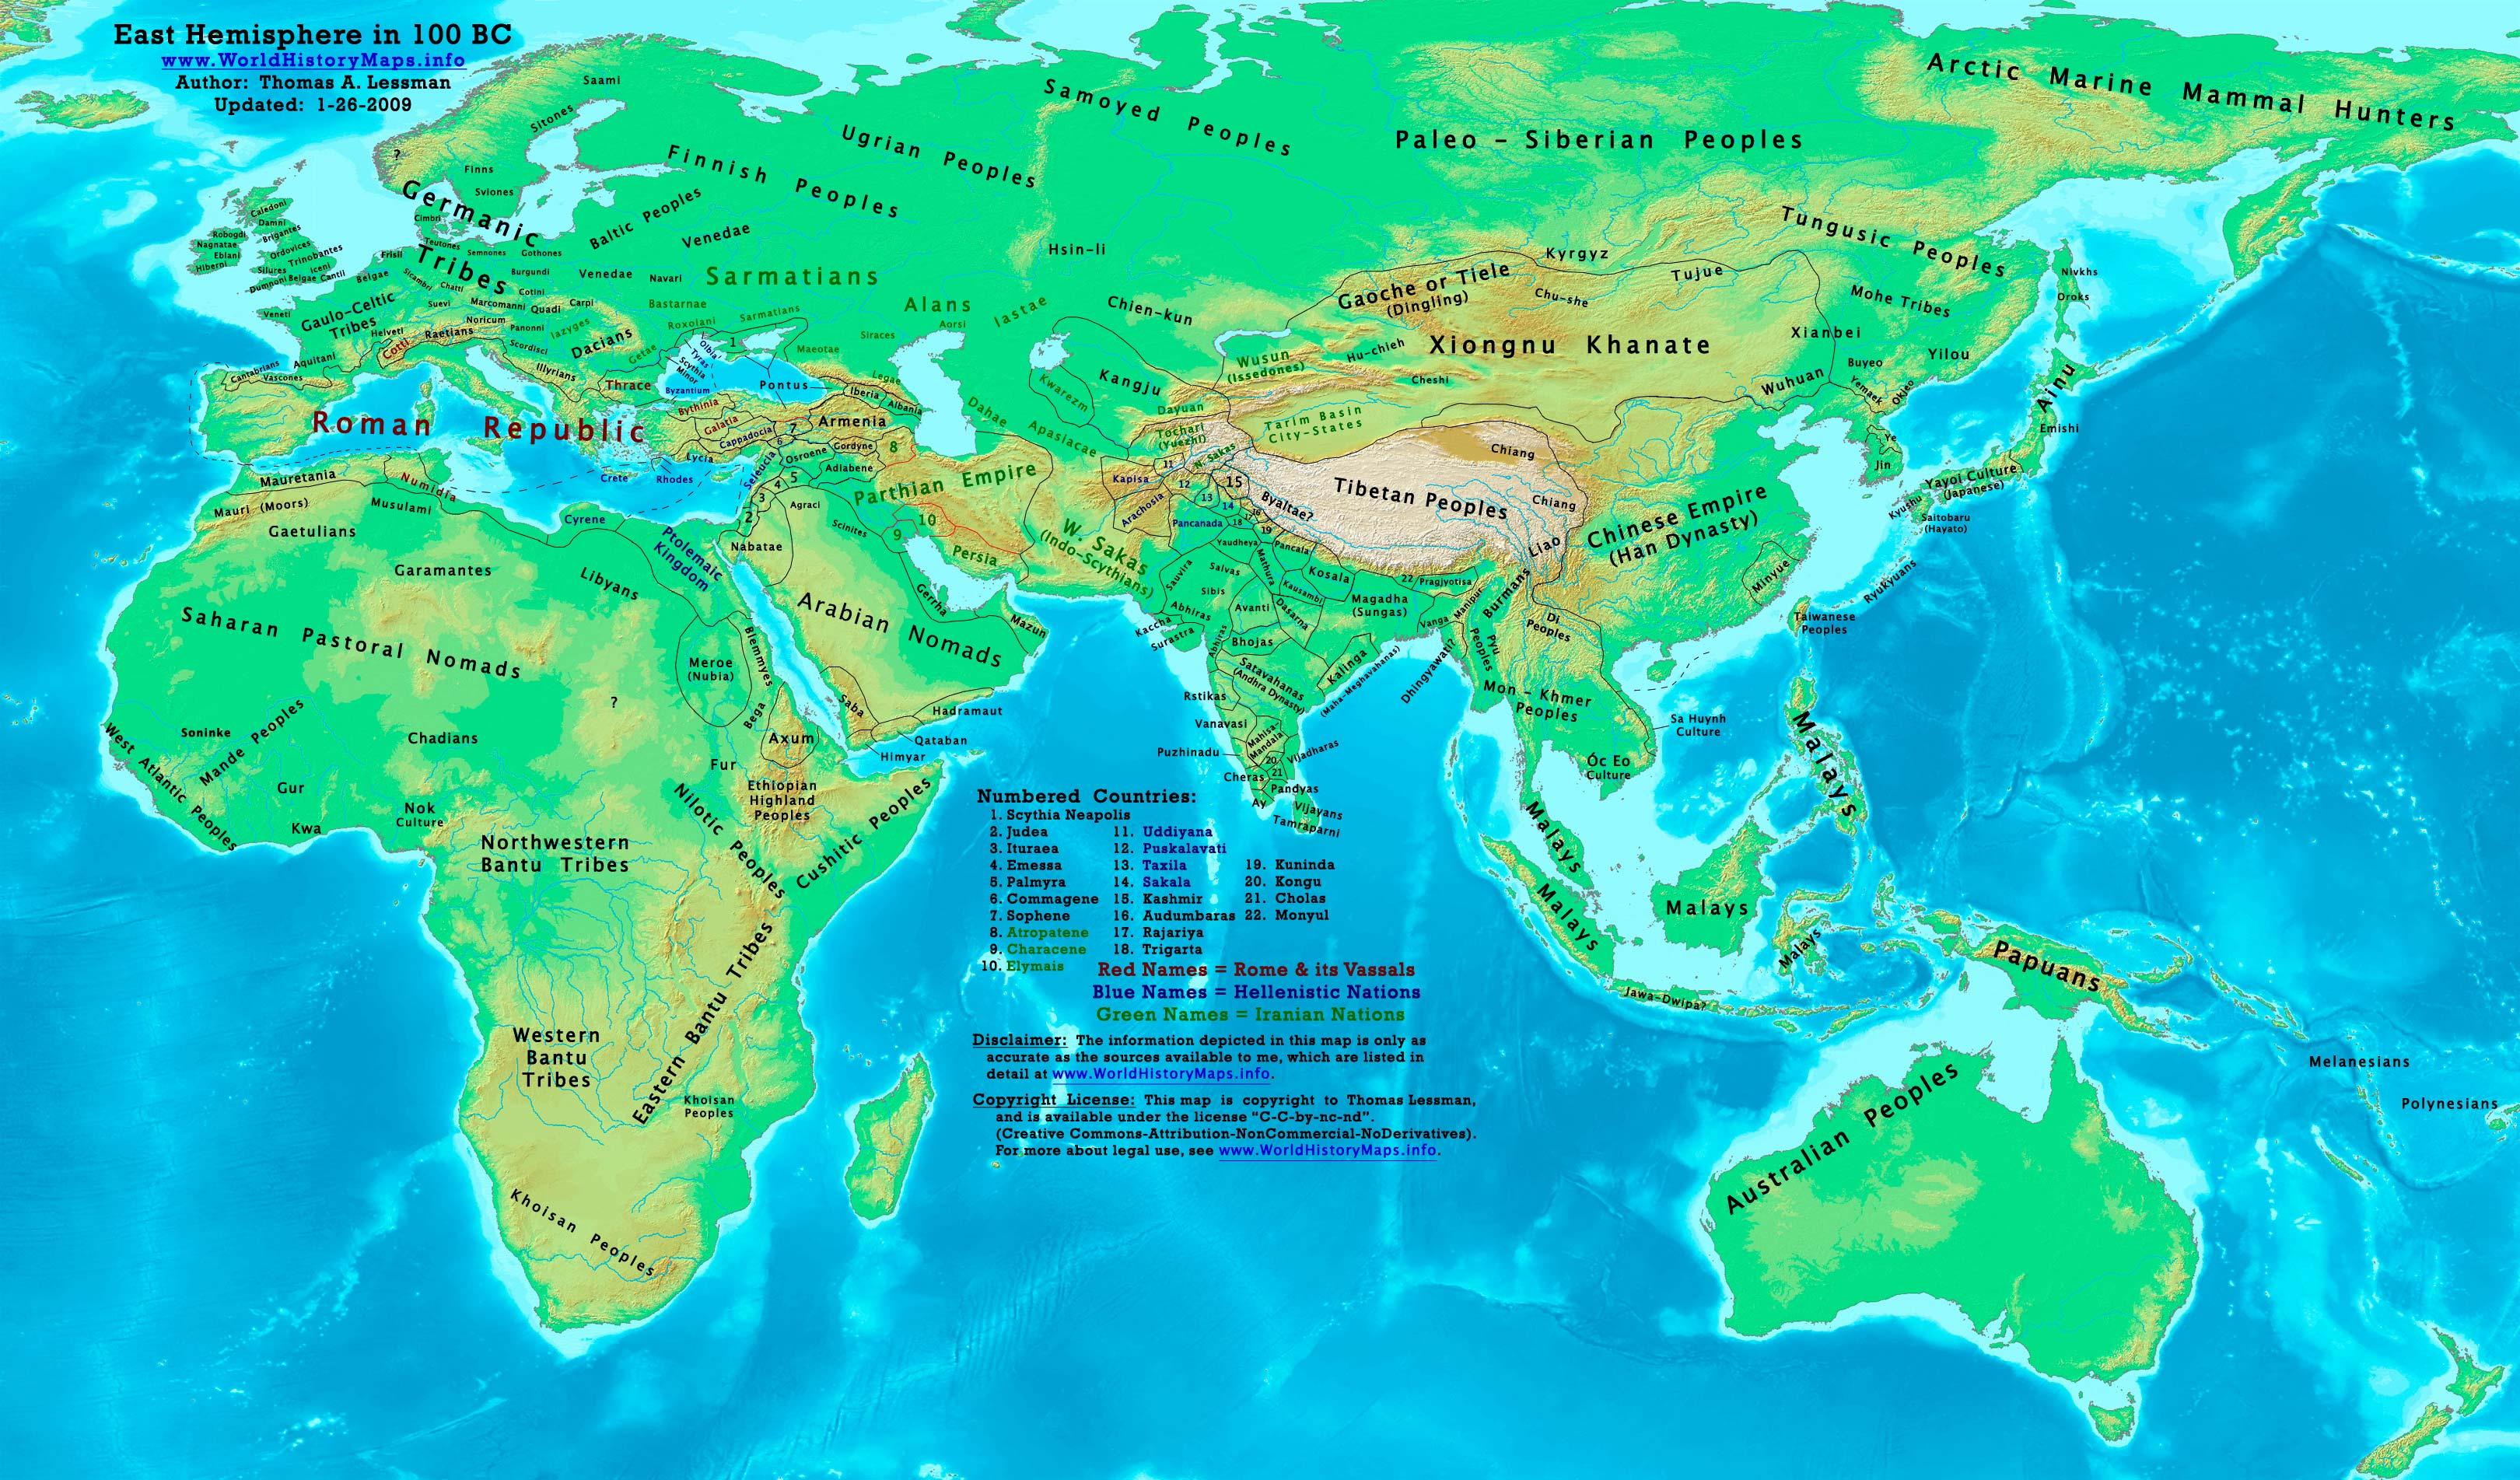 World history maps by thomas lessman 150 bc 100 bc gumiabroncs Choice Image